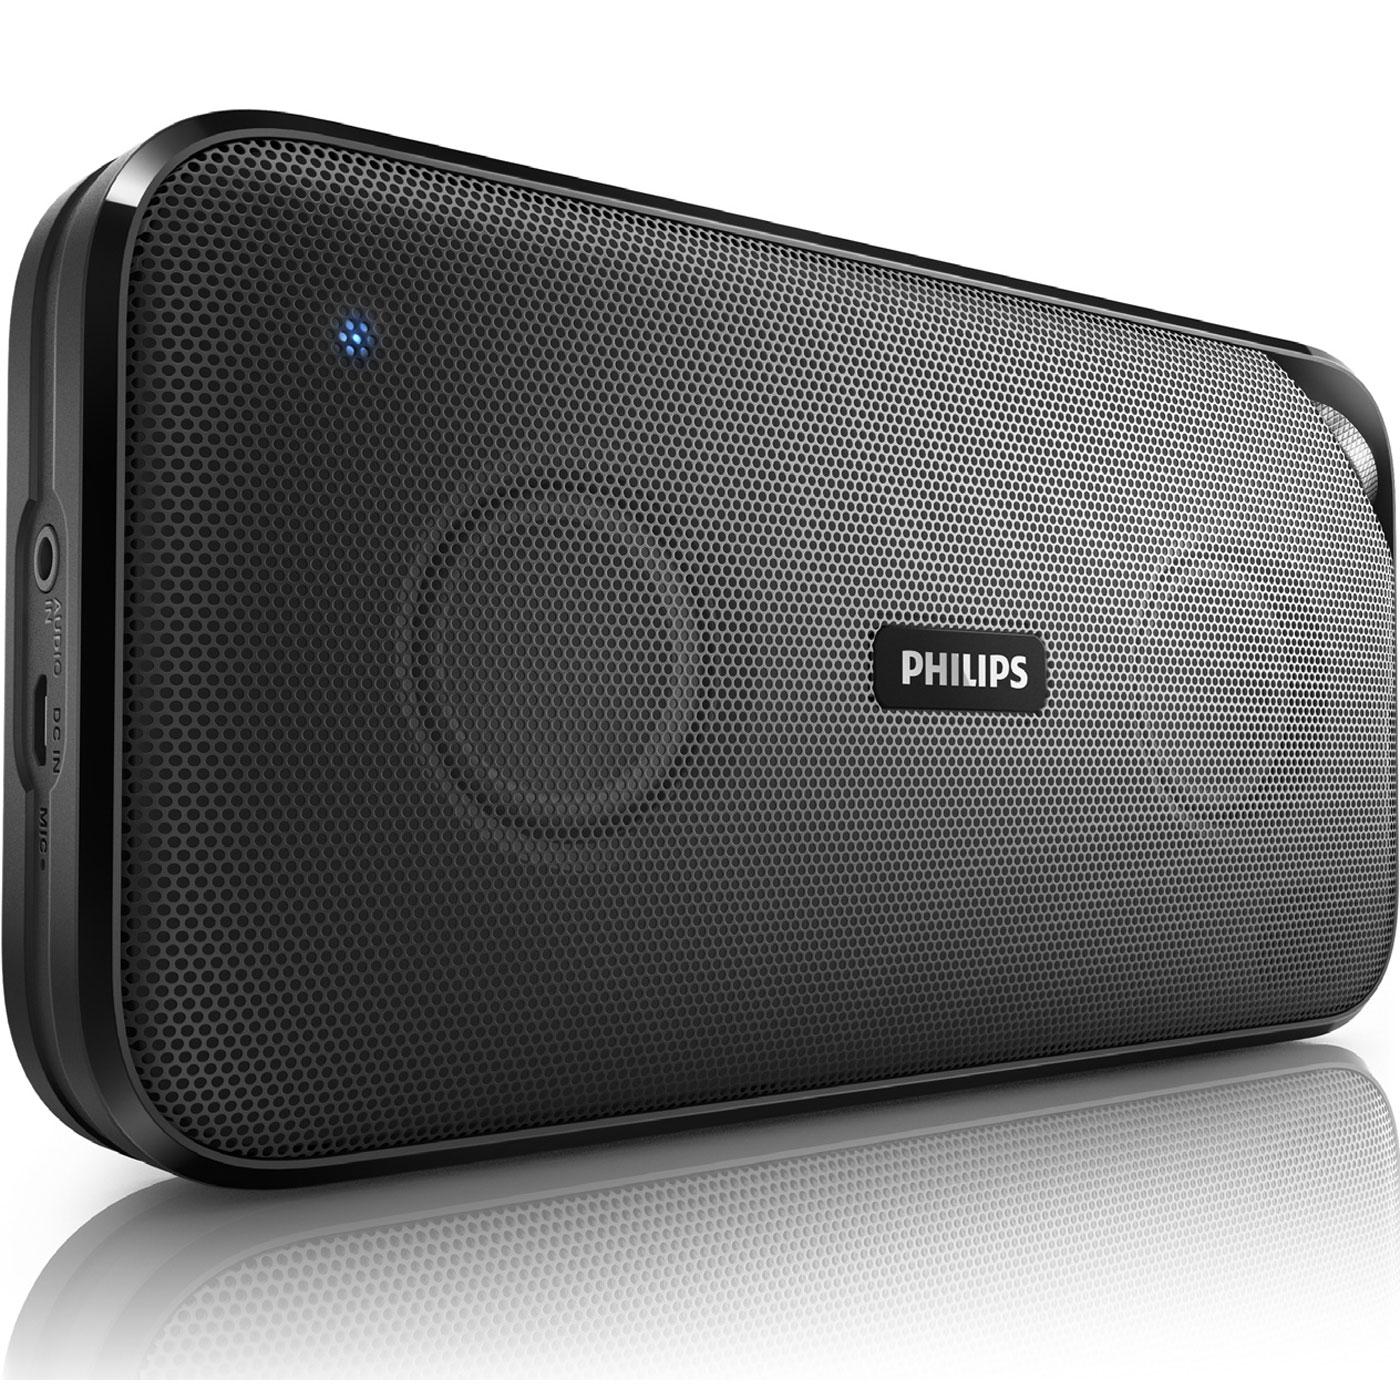 philips bt3500 enceinte portable sans fil bluetooth nfc. Black Bedroom Furniture Sets. Home Design Ideas